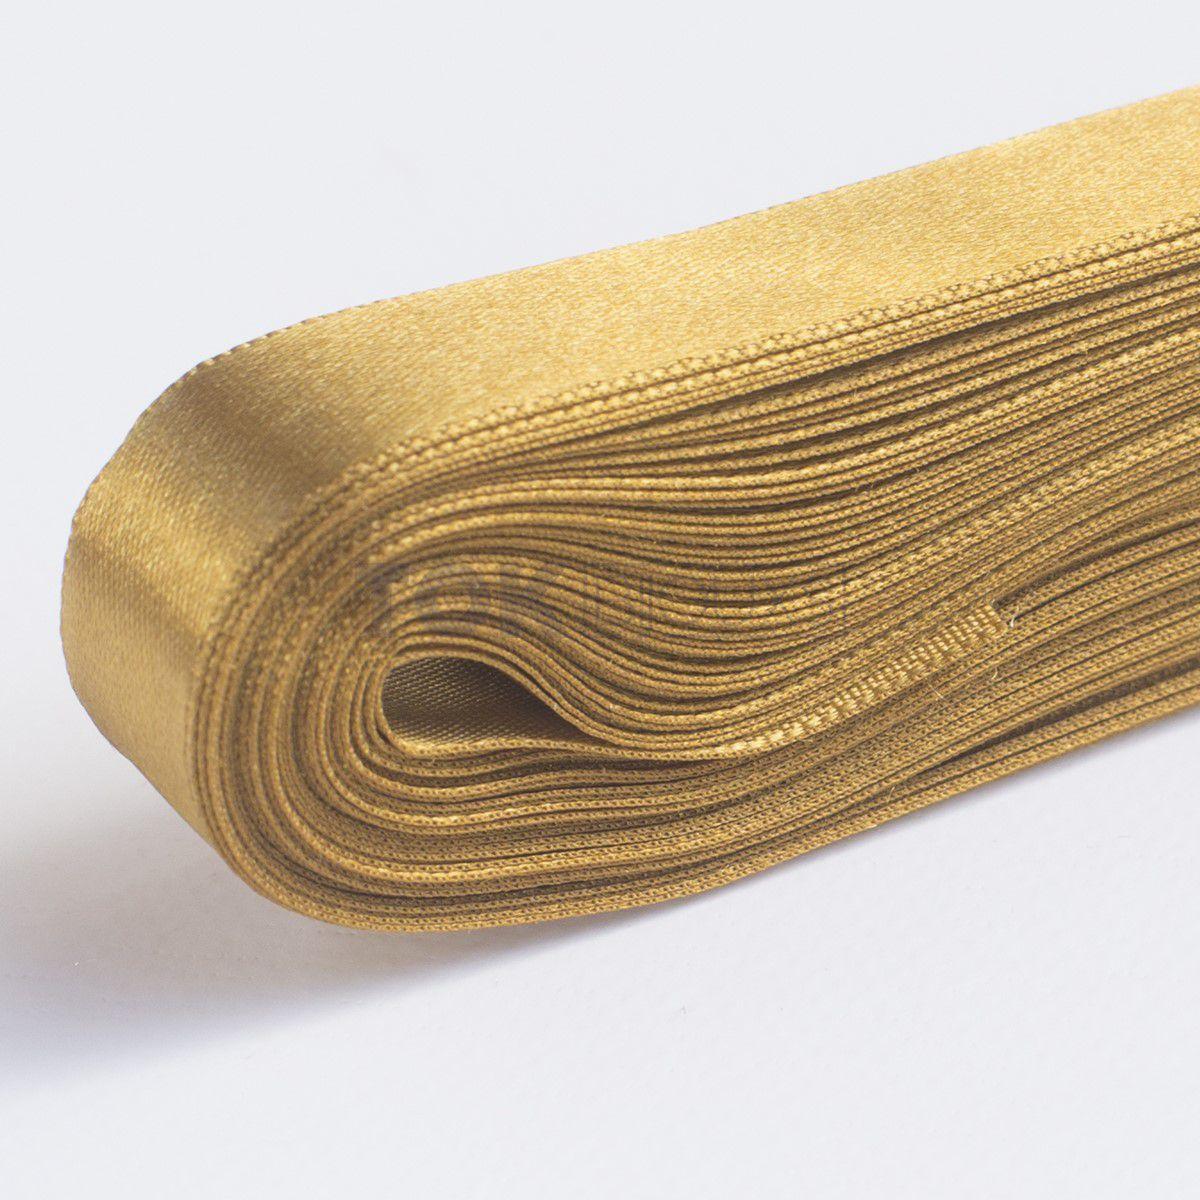 Fita Cetim N.5 - 22mm - 10 Metros - COR (47) Dourado